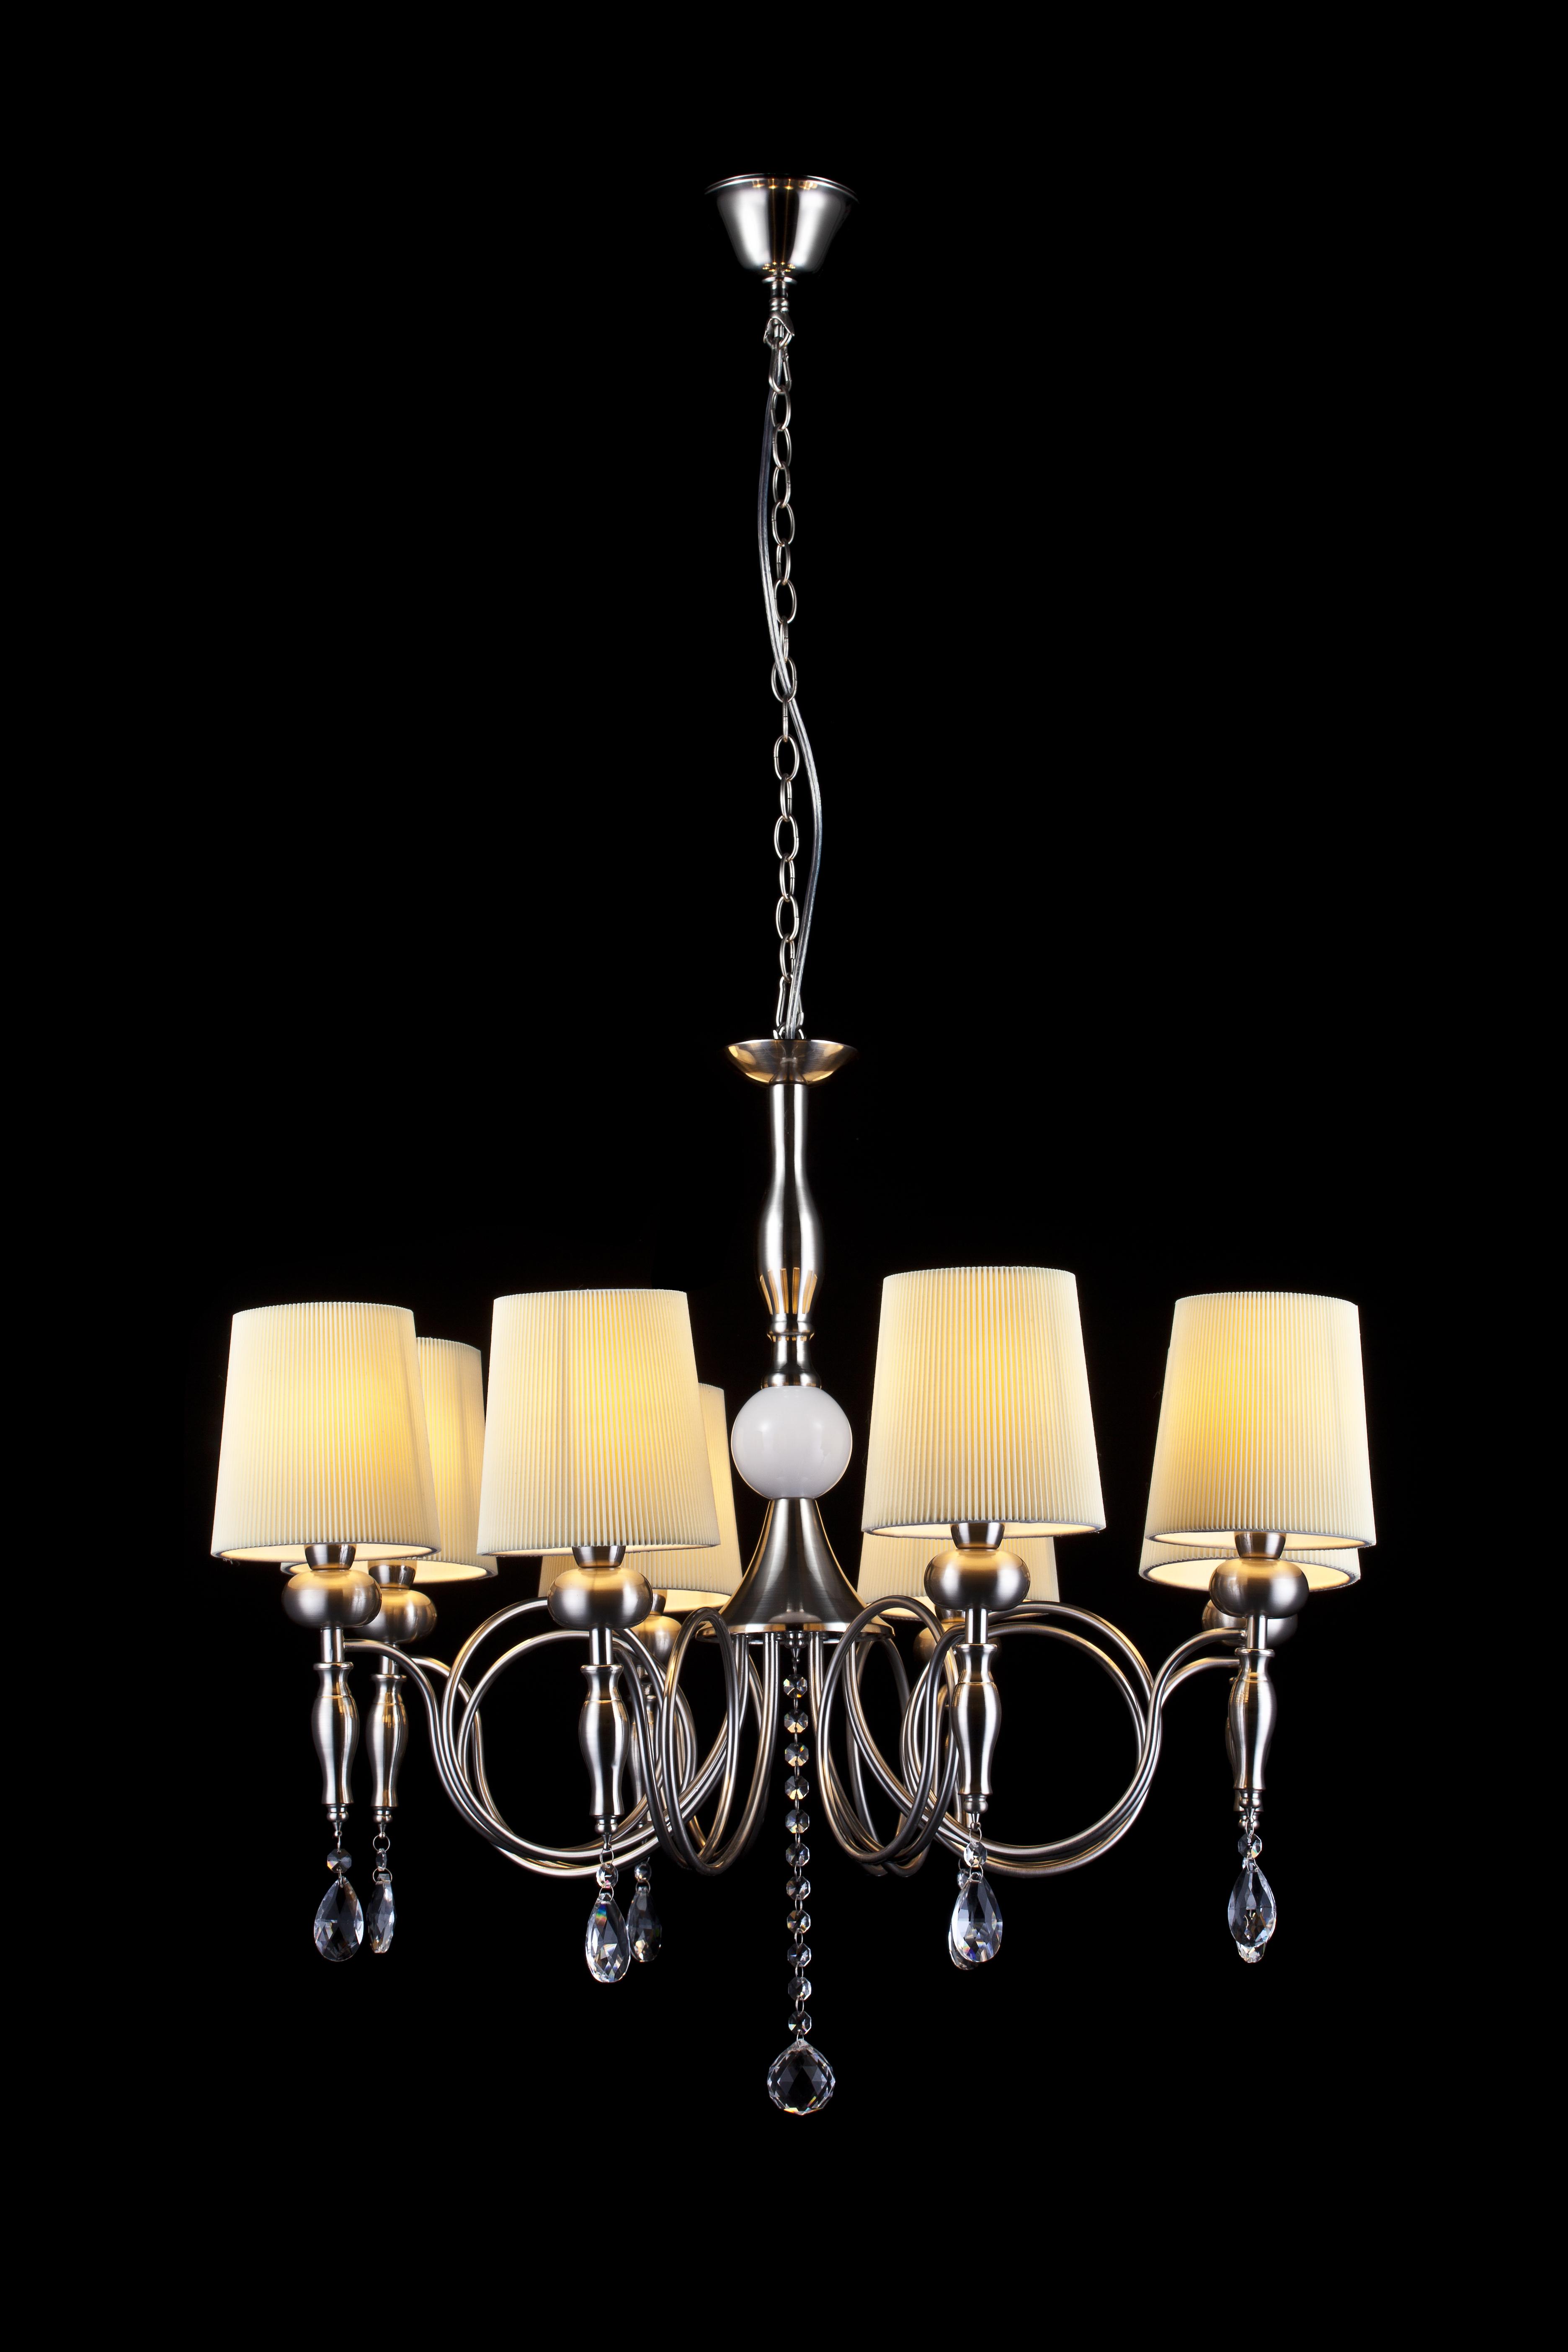 Egyptian Style Modern Crystal Lighting